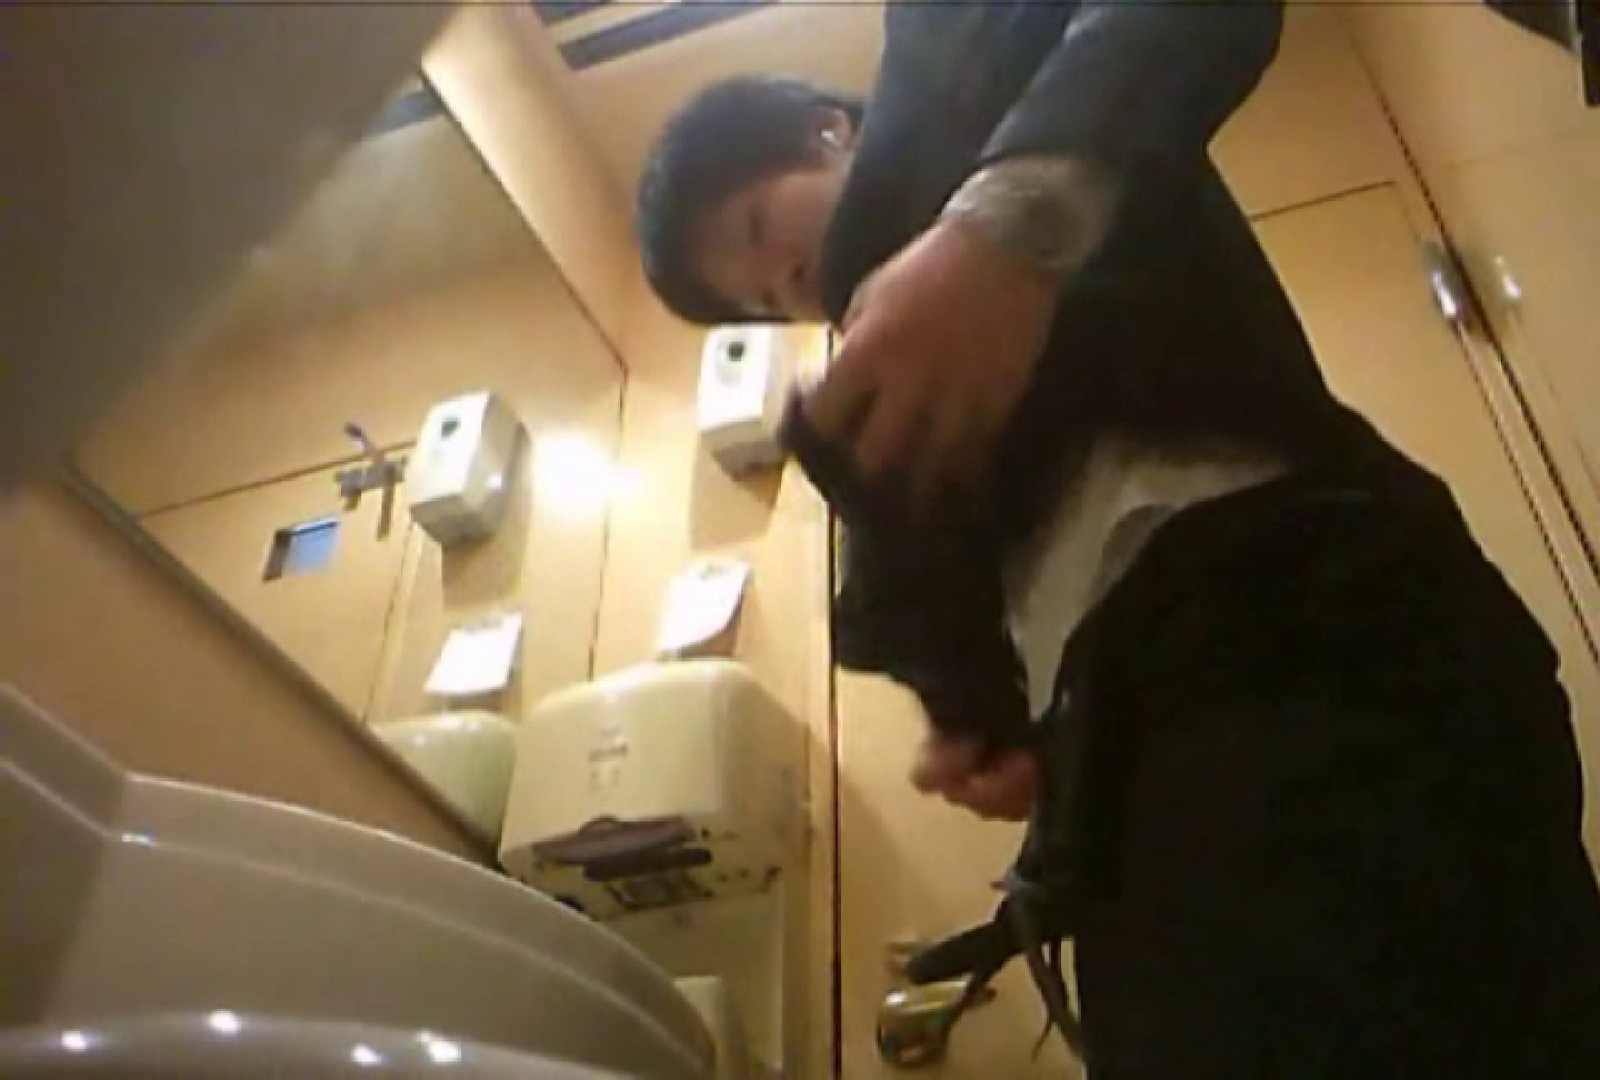 SEASON 3rd!掴み取りさんの洗面所覗き!in新幹線!VOL.23 完全無修正  81pic 59